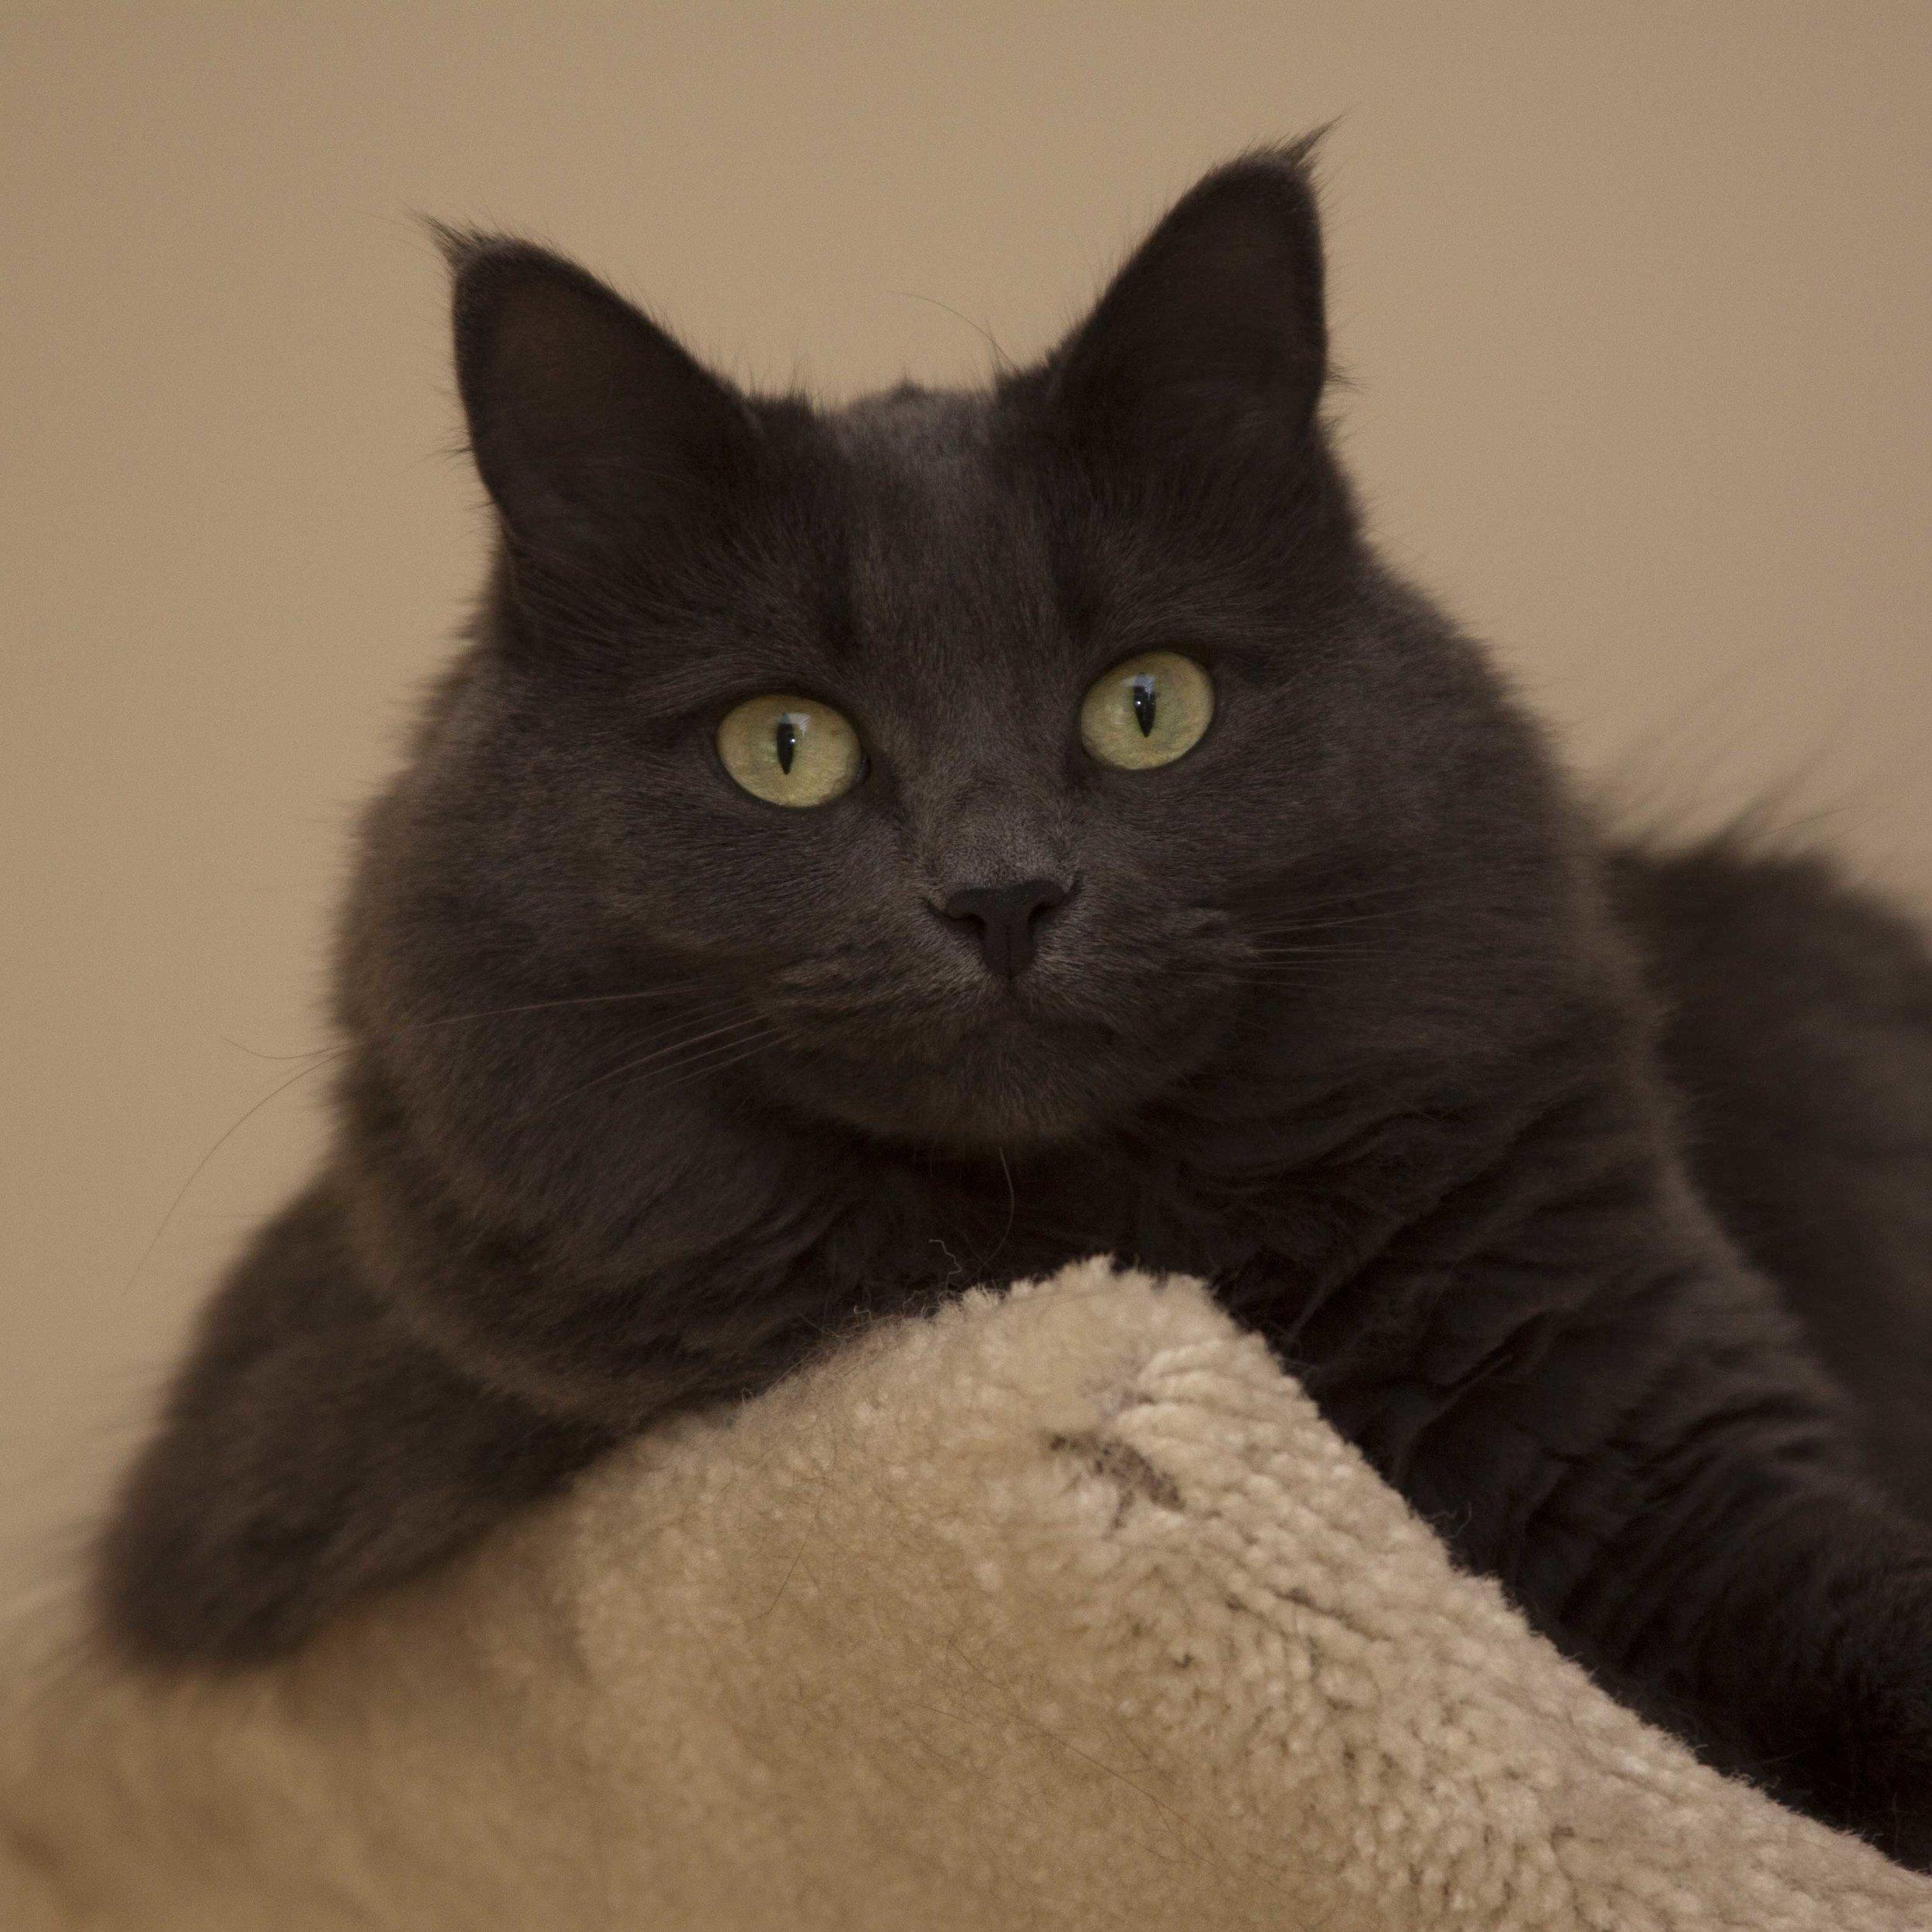 Our cat, Koshka, relaxing